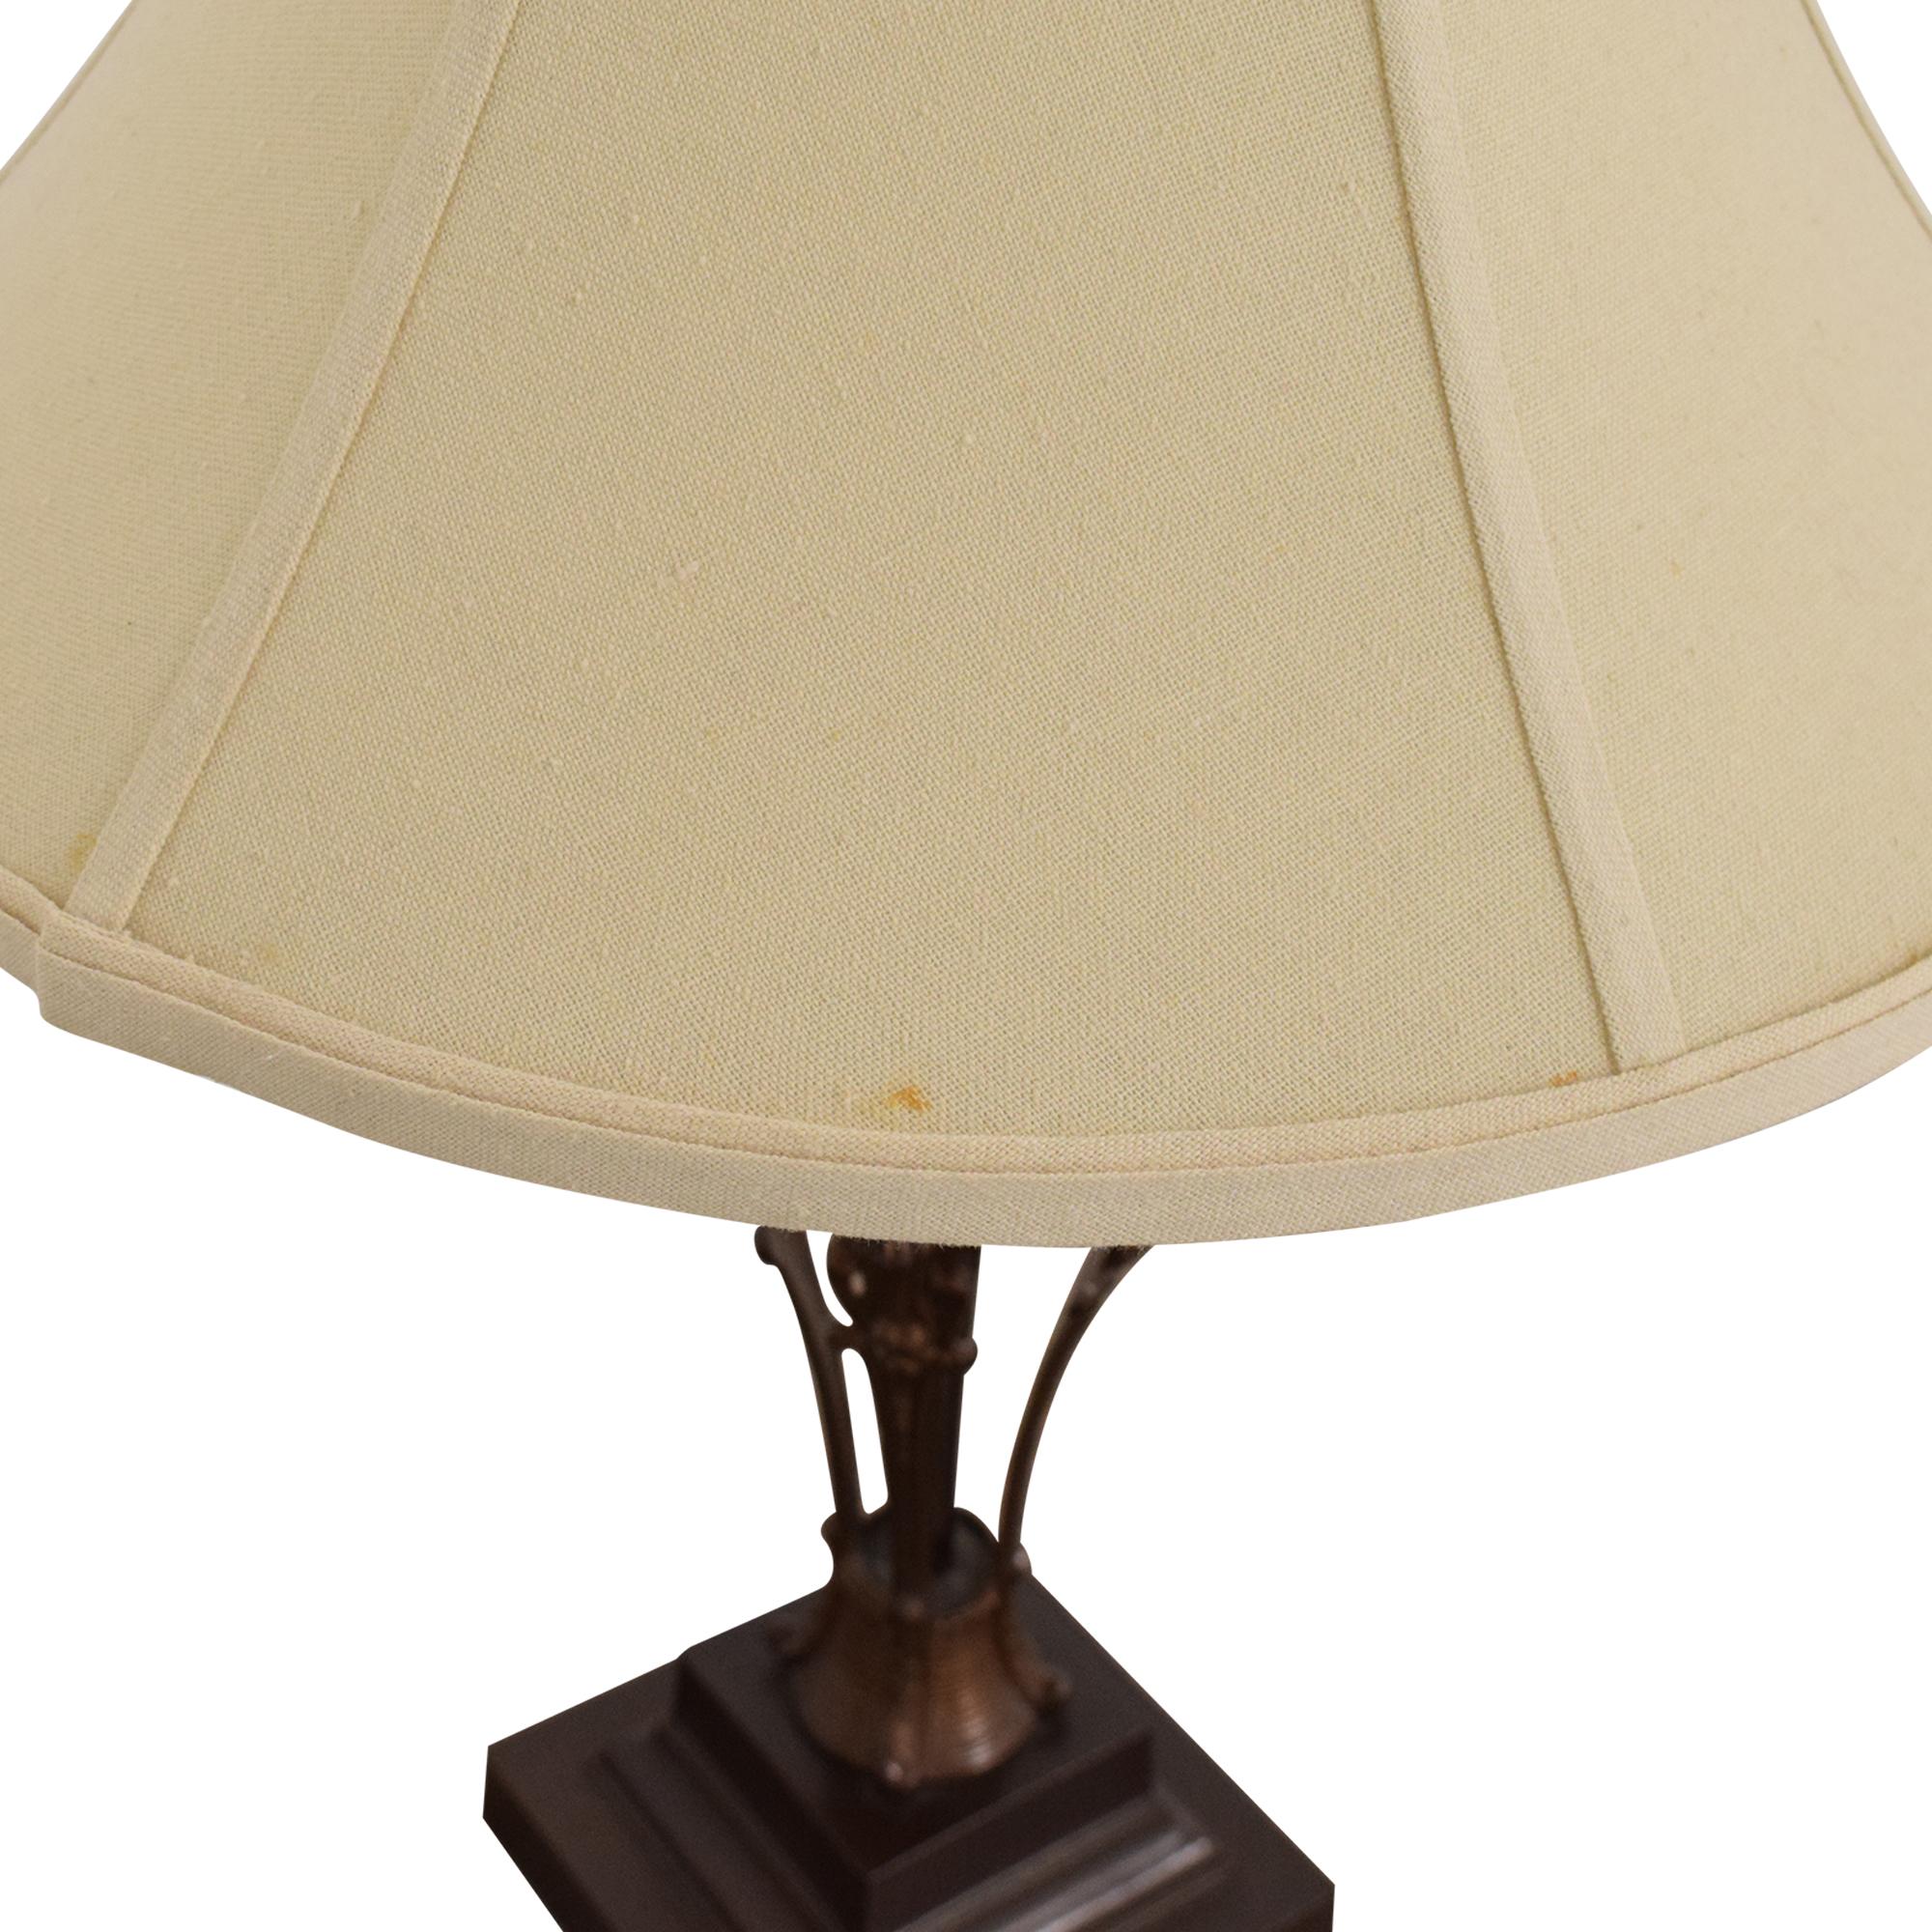 Restoration Hardware Restoration Hardware Table Lamps coupon